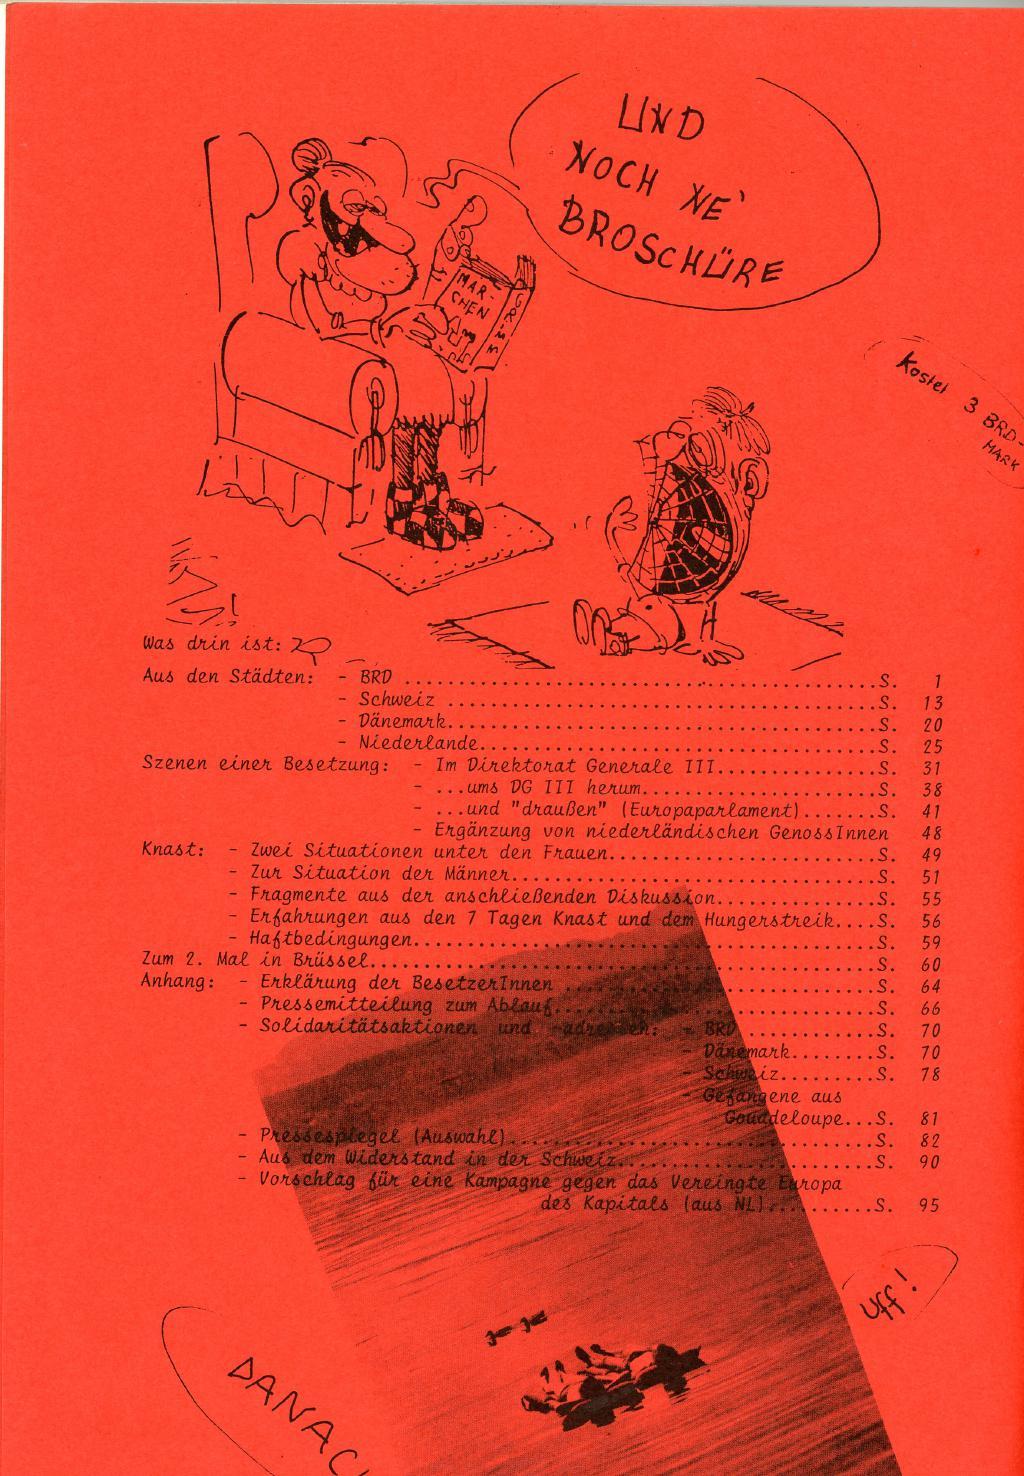 Belgien_Doku_Besetzung_EG_Kommission_1989_002